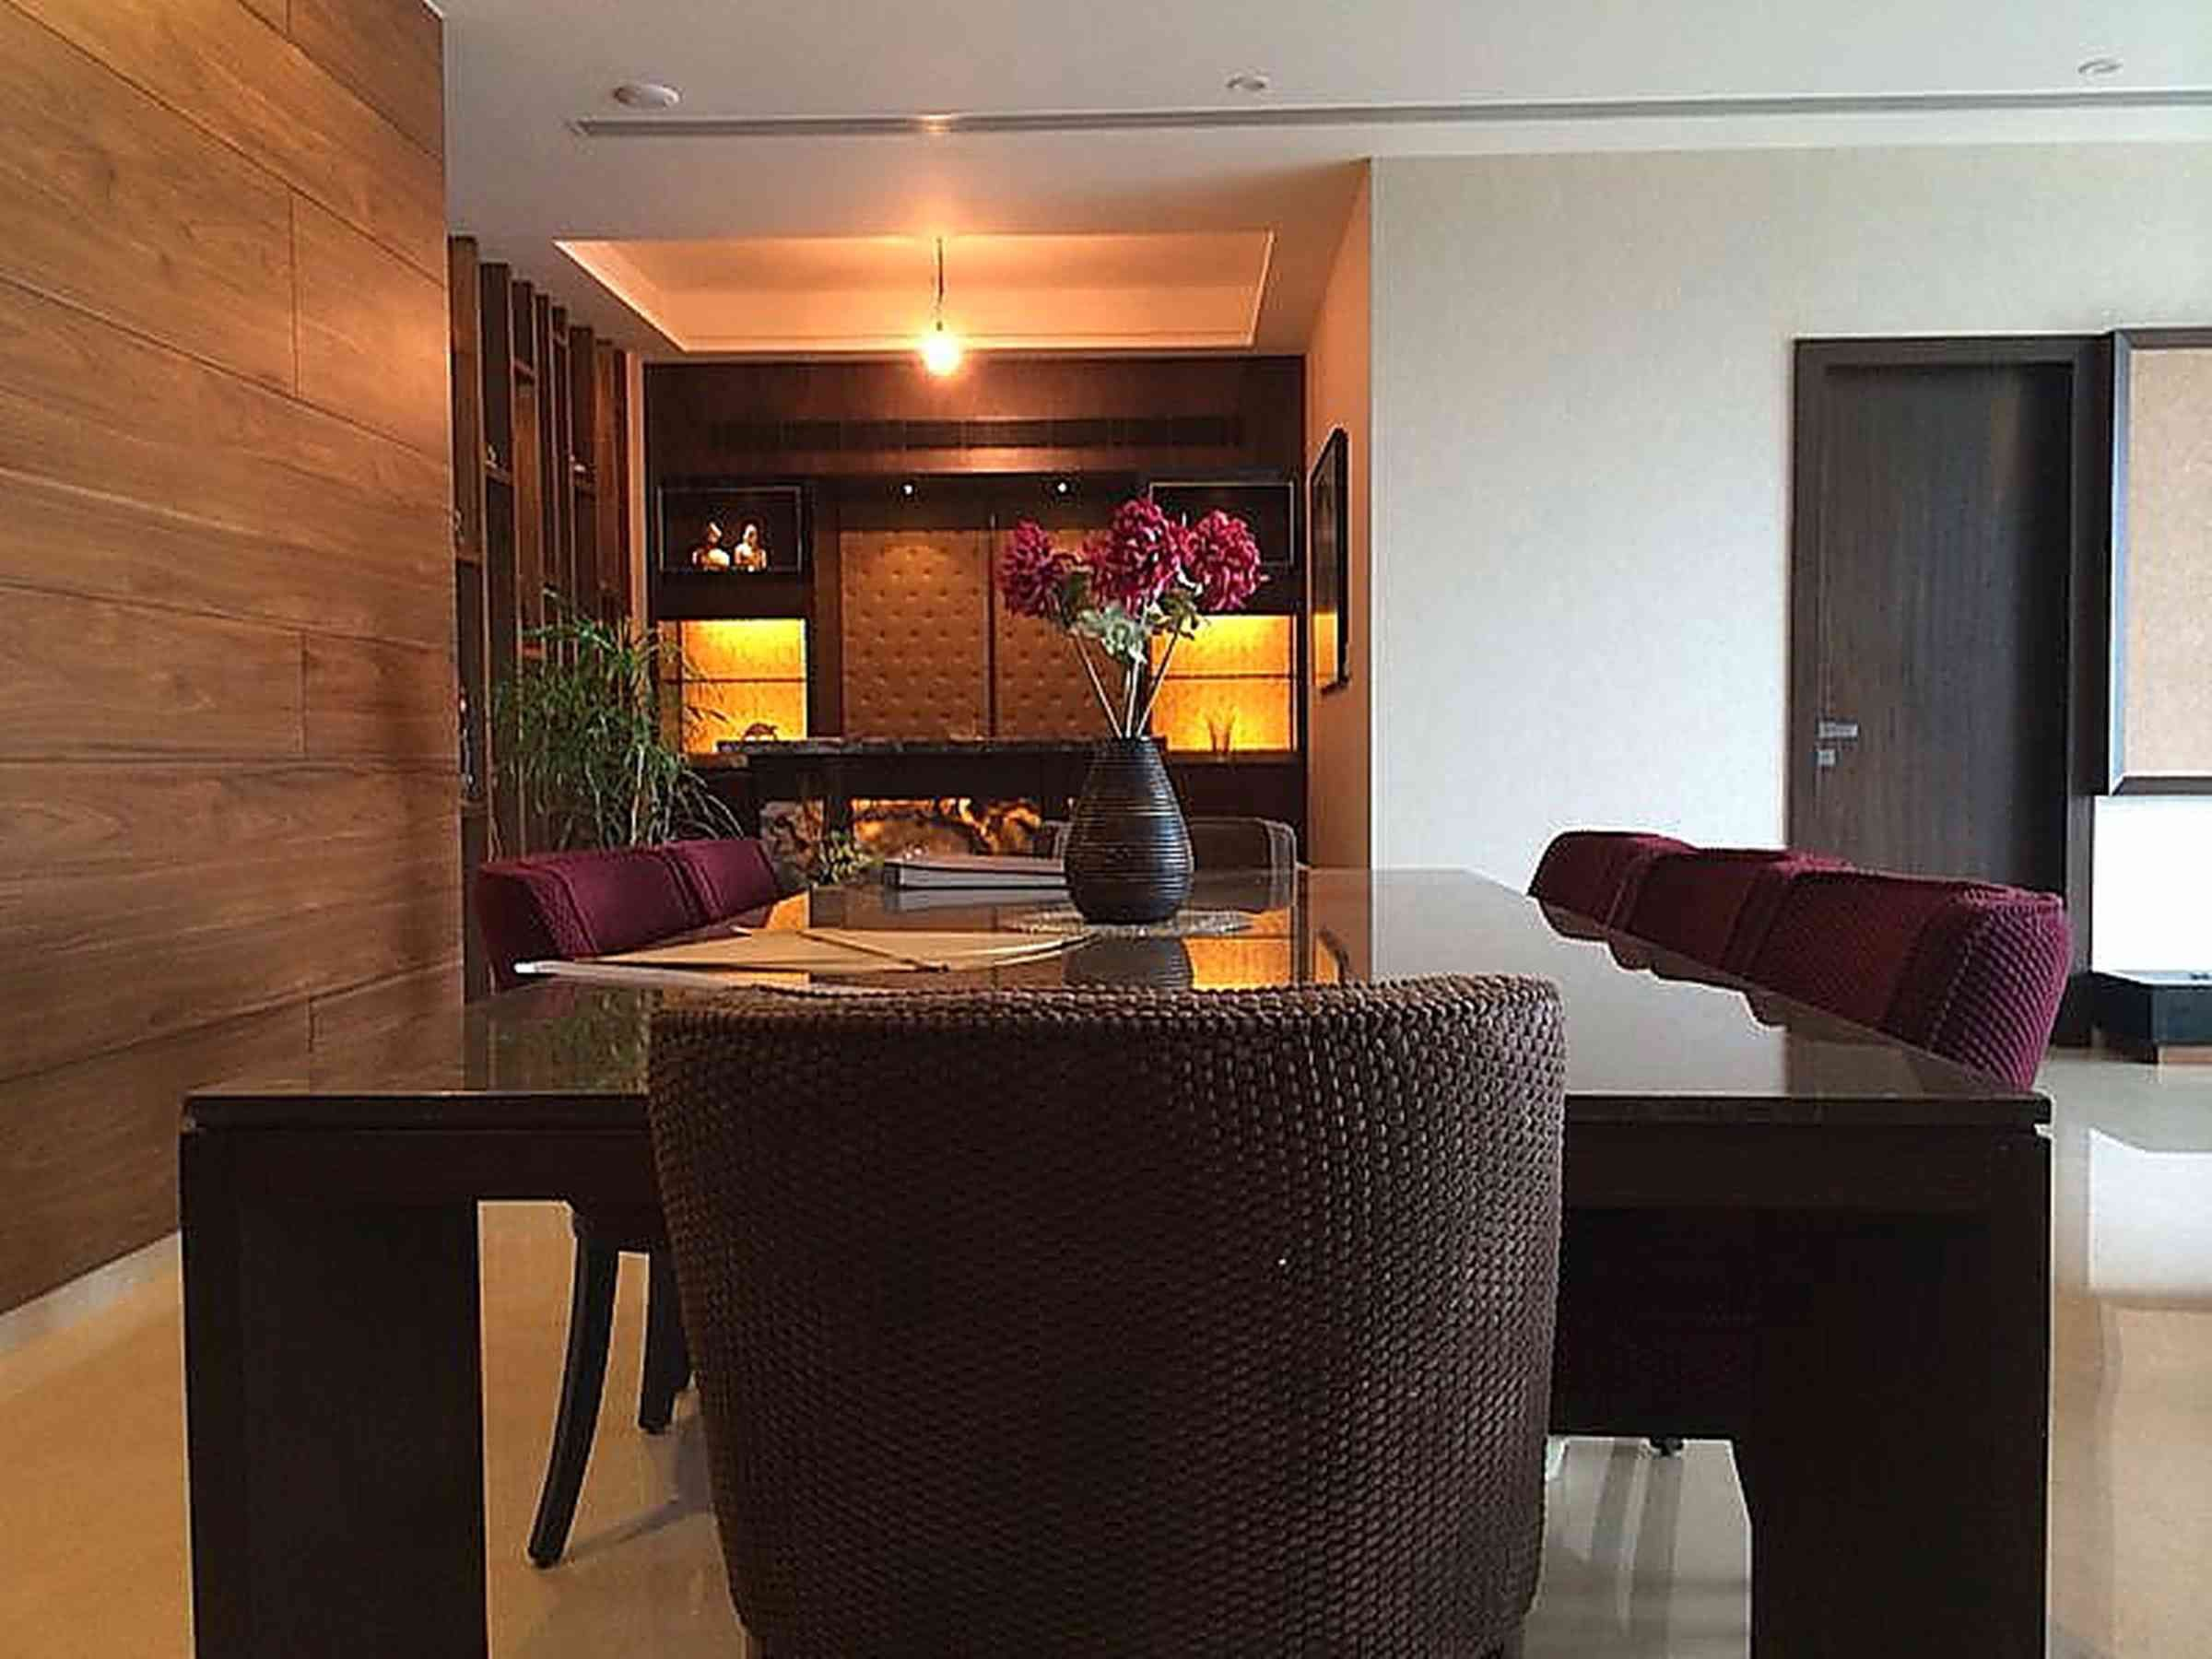 zingyspotlight today 4bhk residential interior